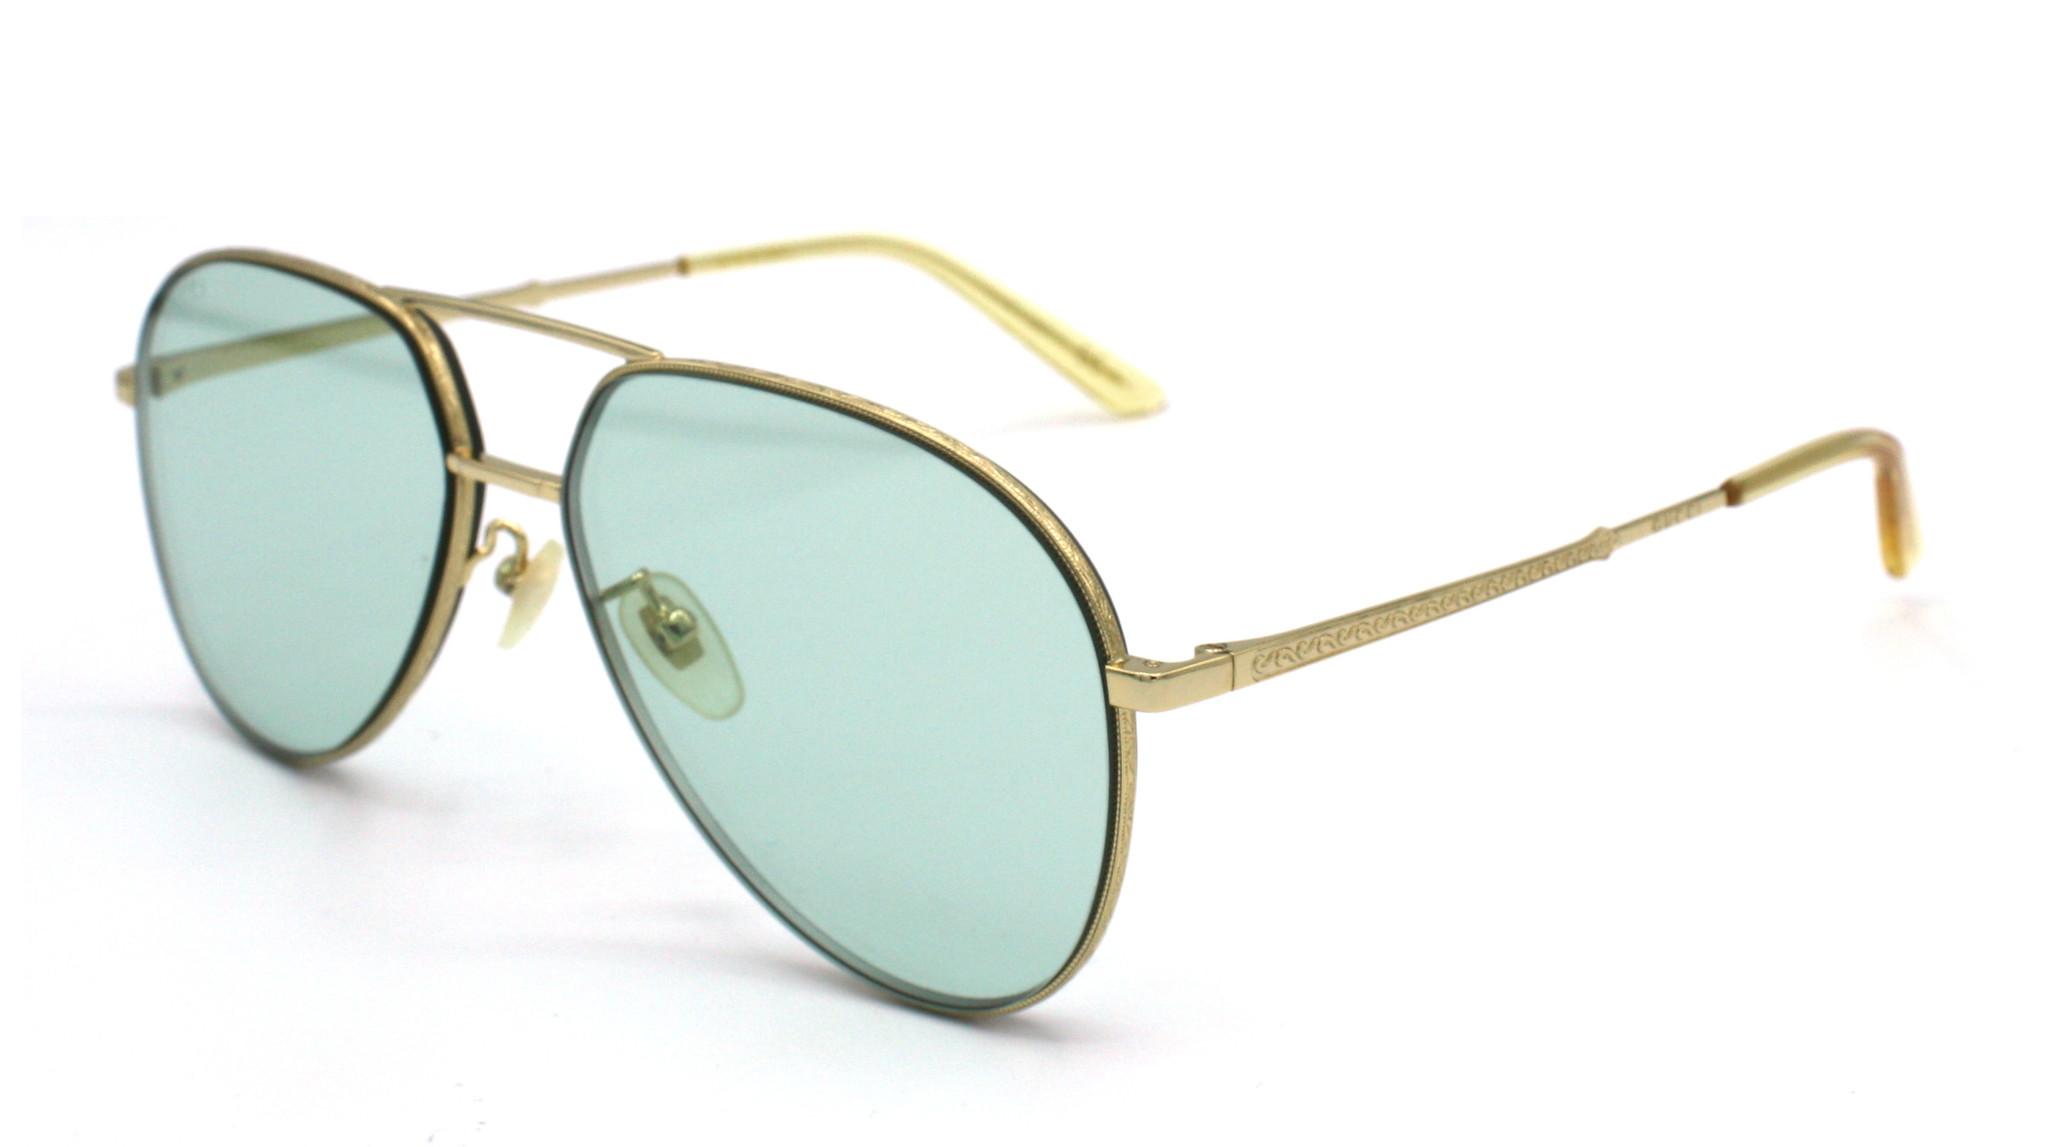 Gucci - GG0356S - 004 - Gold Green-1